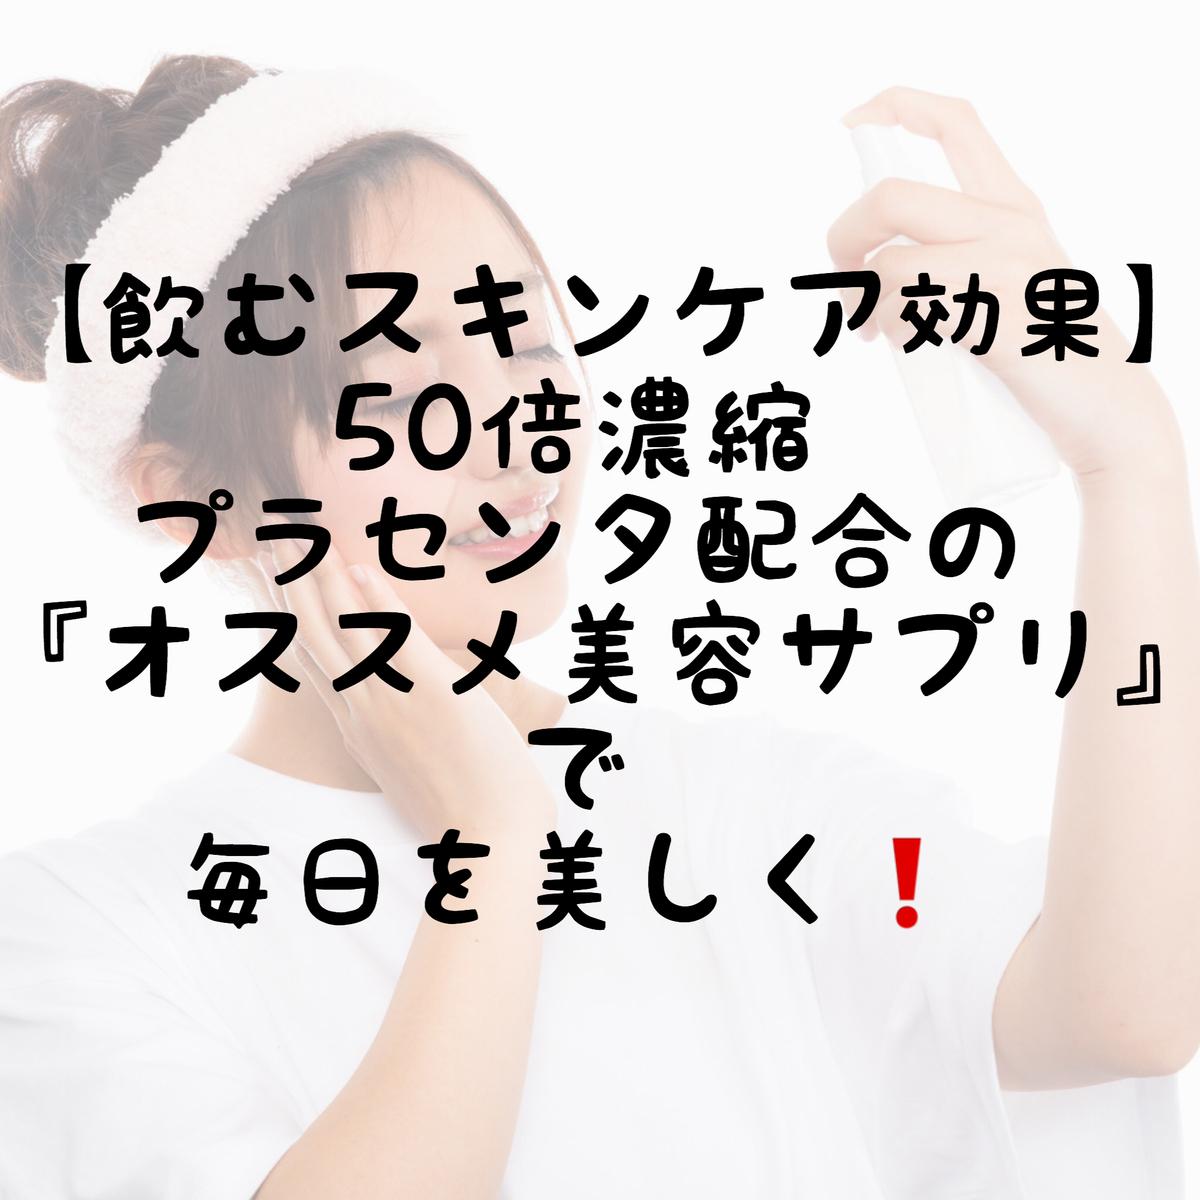 f:id:nokonoko_o:20200623163943j:plain